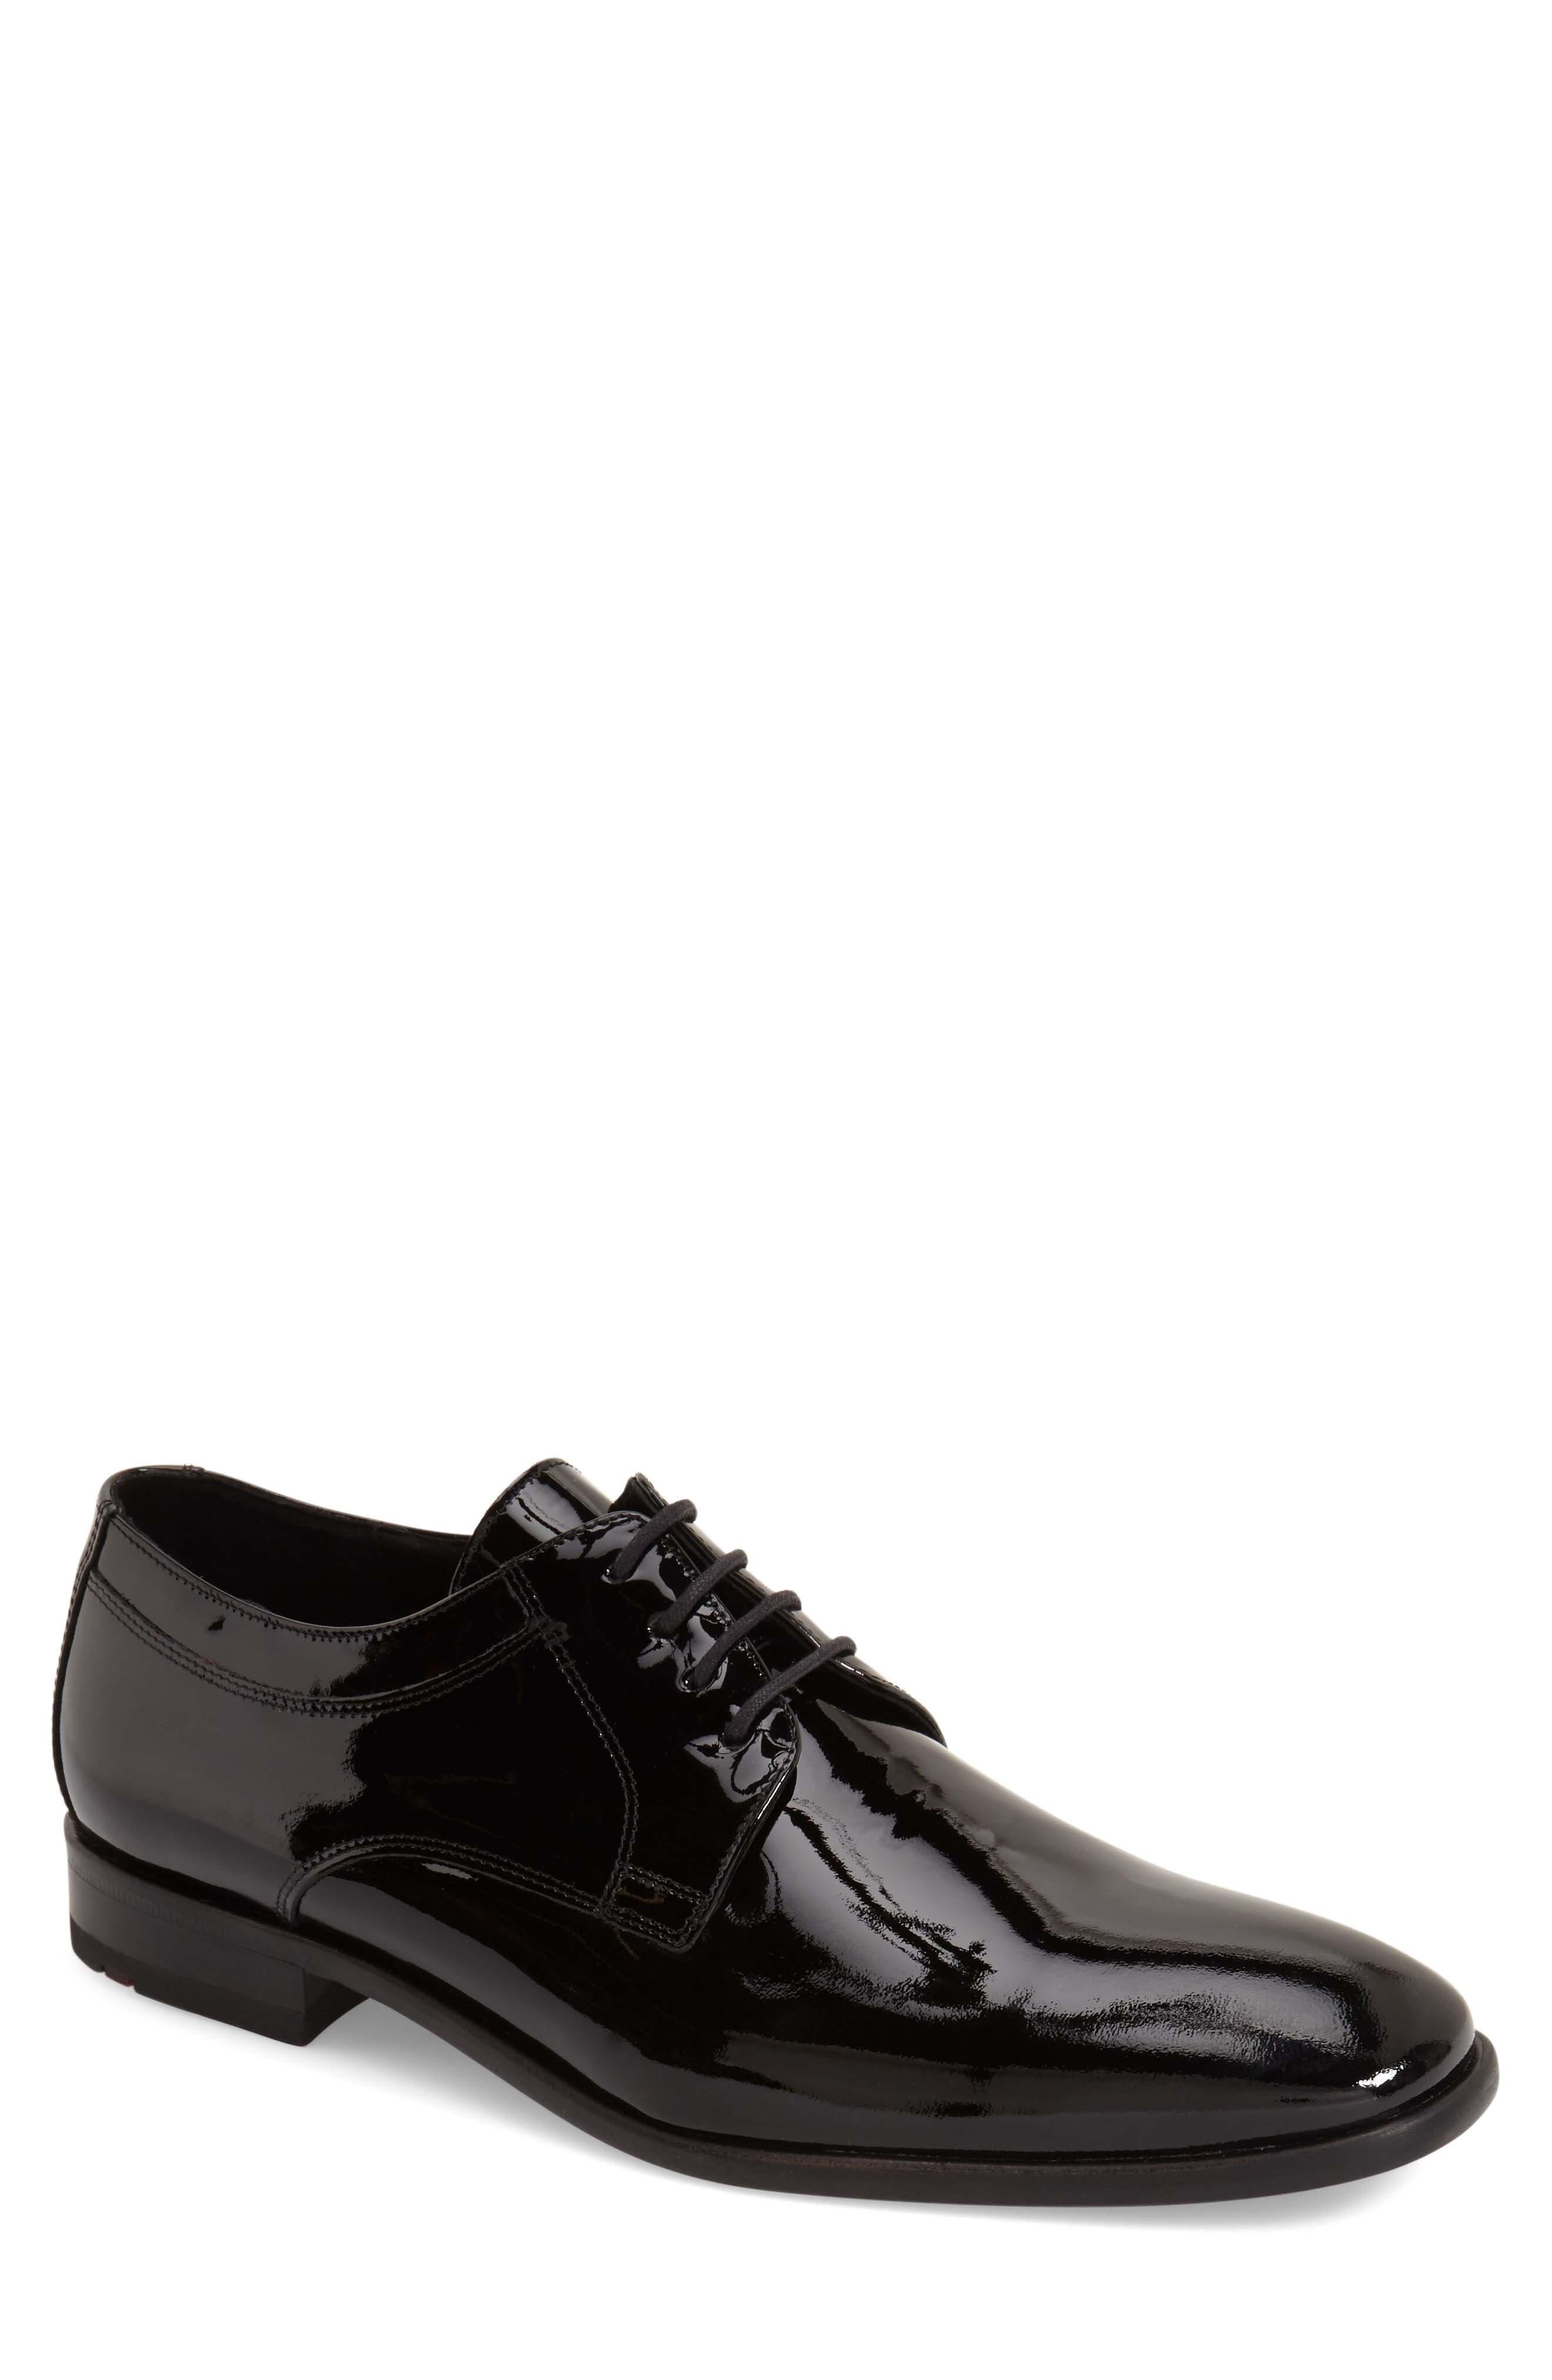 Lloyd Freemand Plain Toe Derby (Men)